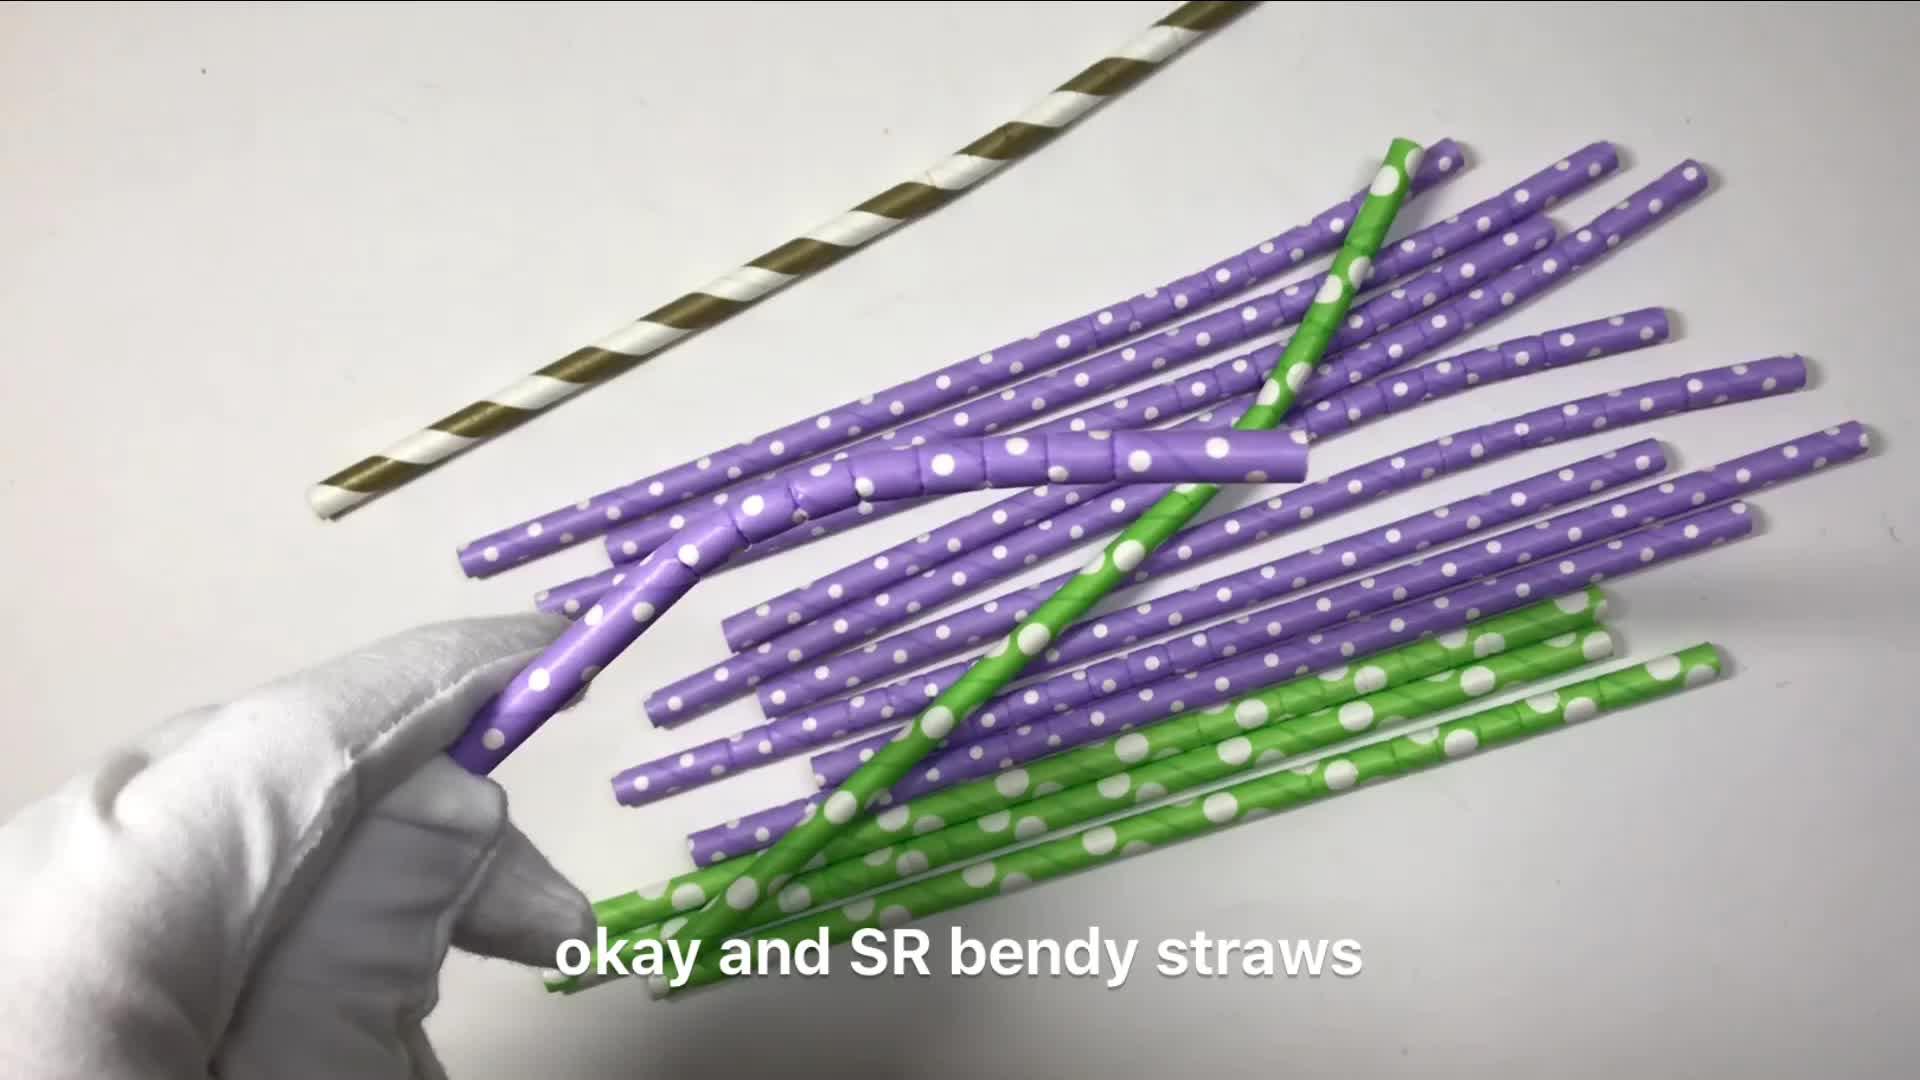 SR 10000PCS Food Grade Biodegradabile di Ben Curva Bendy Flessibile Bianco di Carta Paglia di piegatura